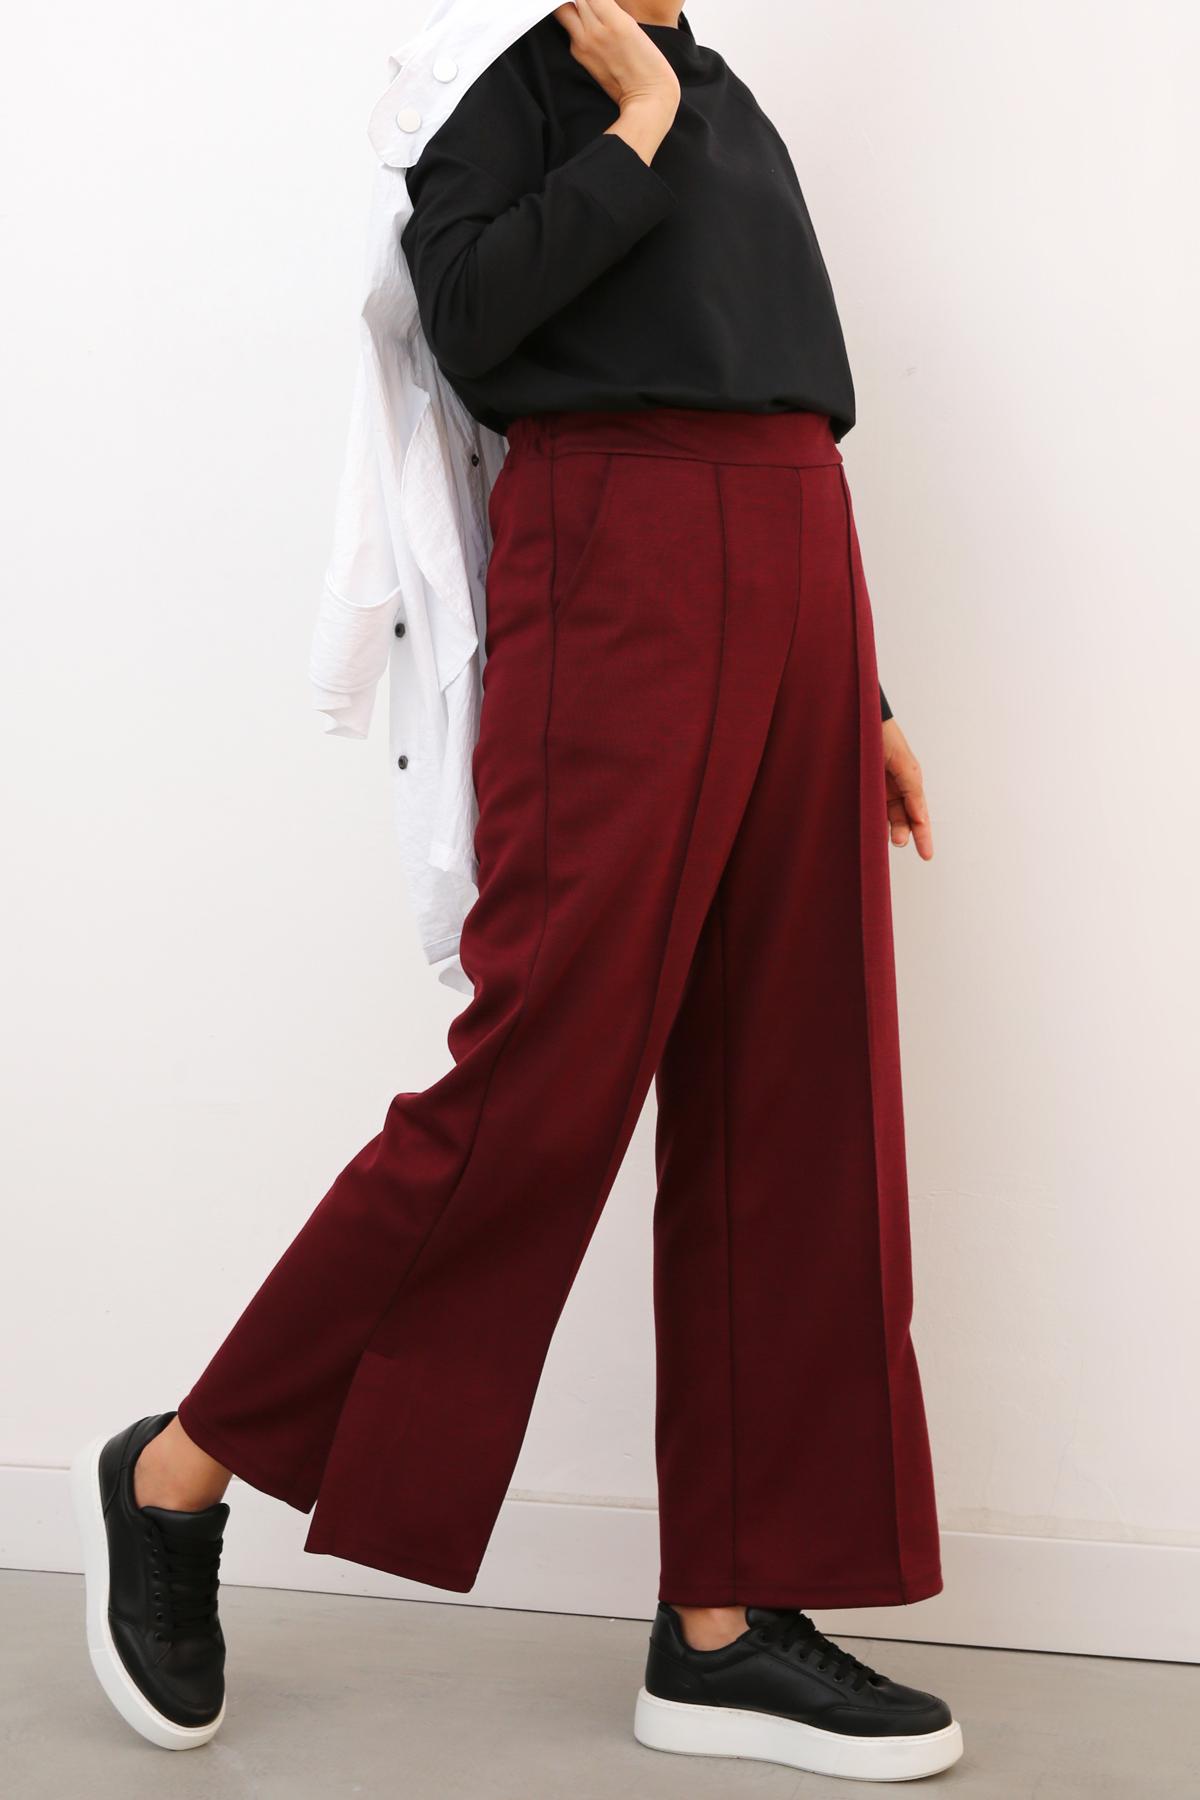 Slit Hem Lace Detailed Pants